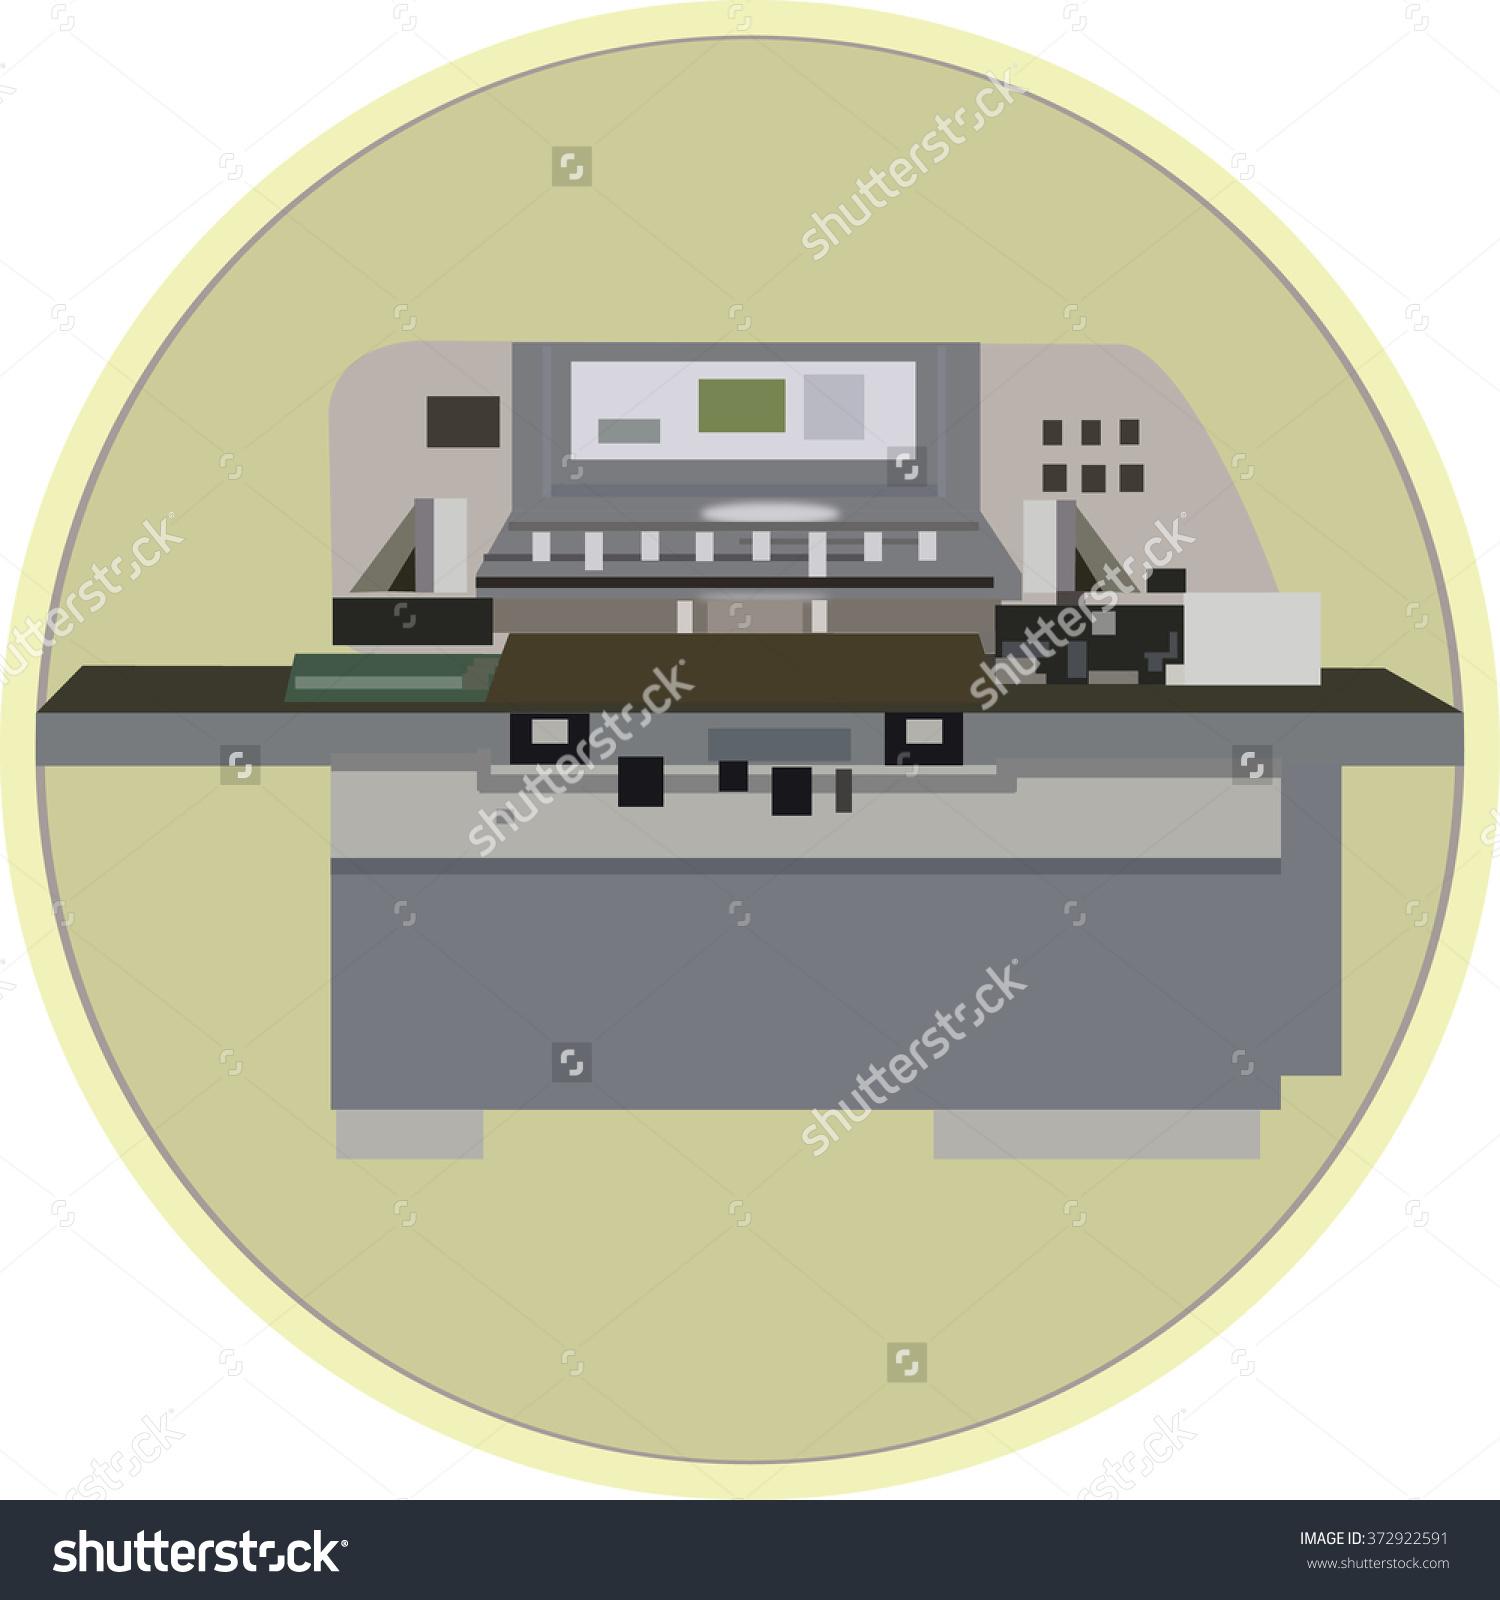 Clip Art Cutting Machine Stock Vector Illustration 372922591.